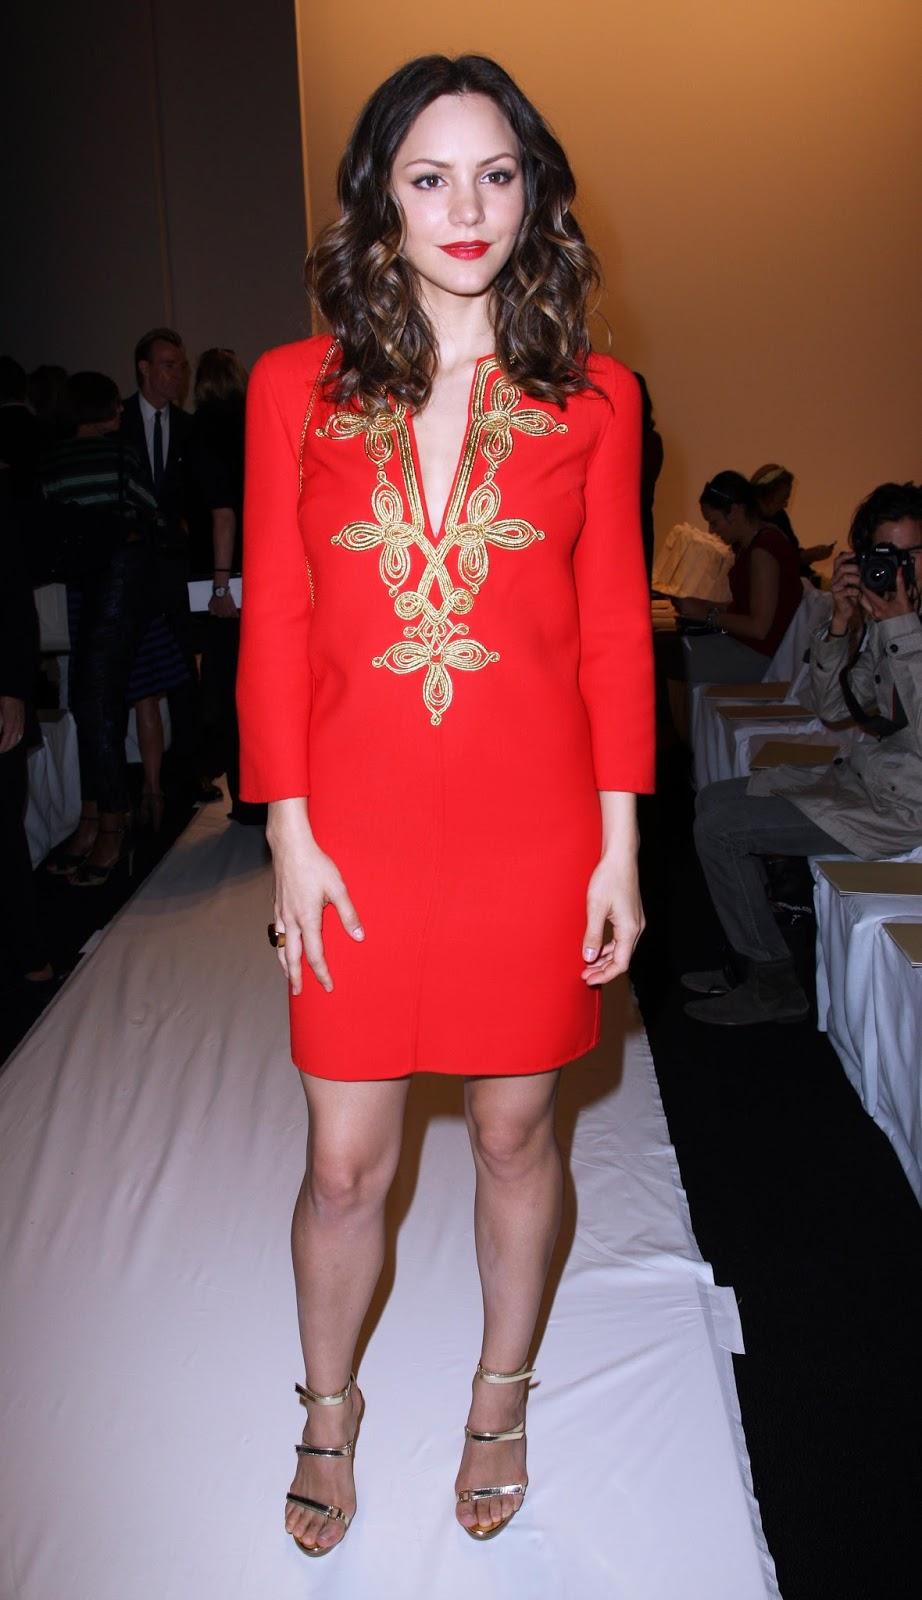 HQ Wallpapers and Photos Katharine McPhee at Mercedes-Benz Fashion Week